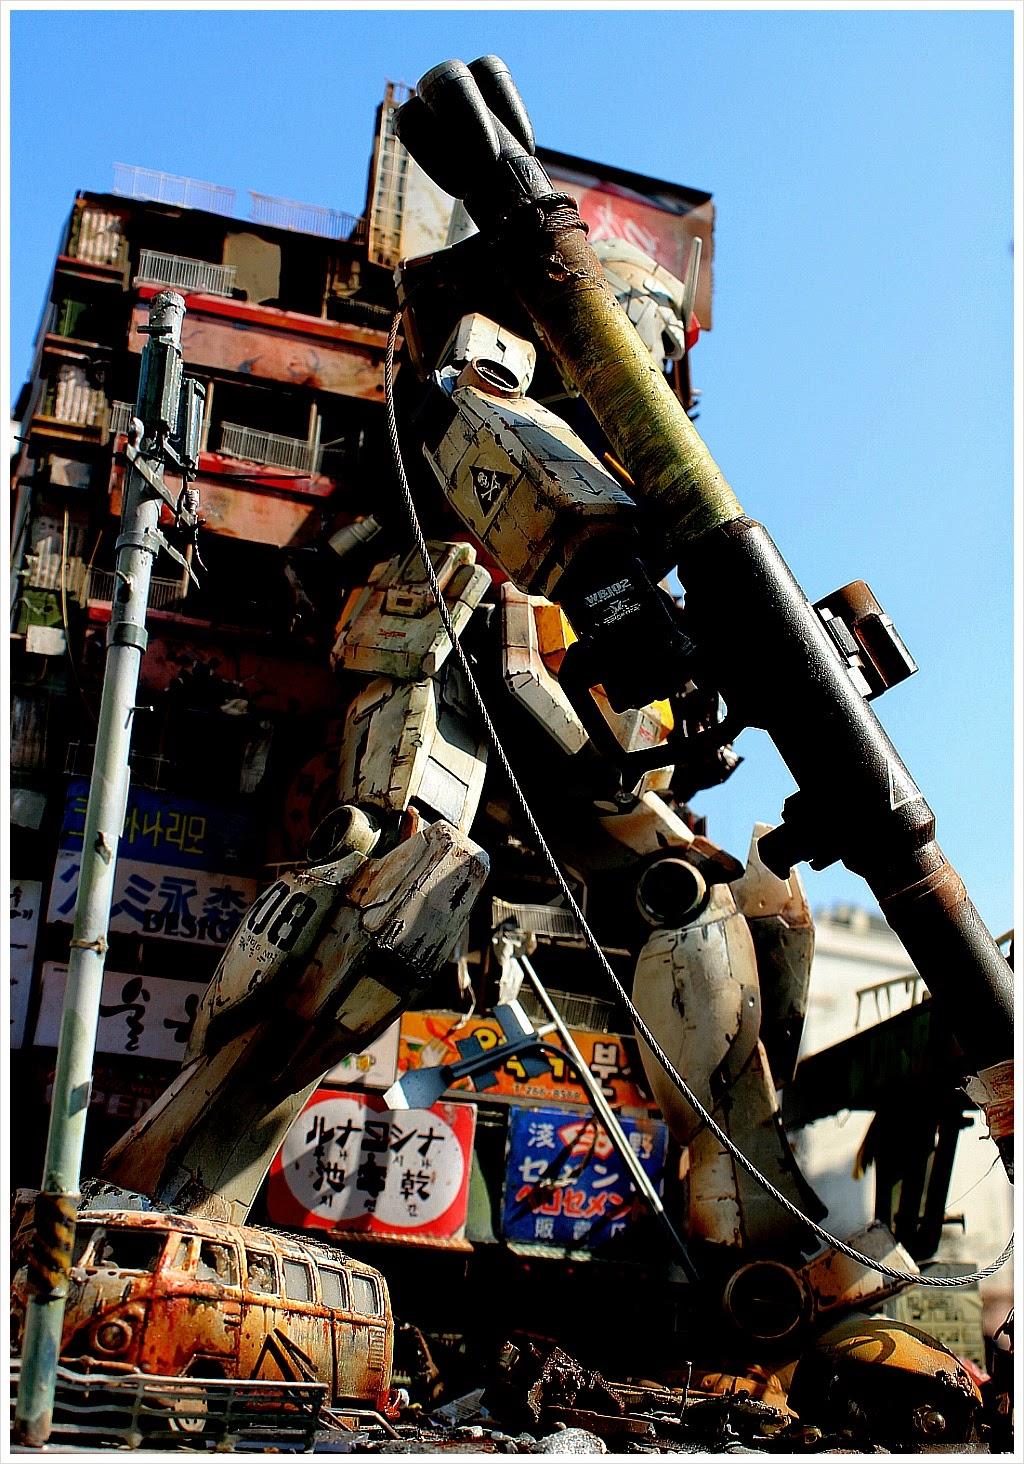 78 Images About Temperance On Pinterest: GUNDAM GUY: 1/48 RX-78-2 Gundam 'The Last Survival